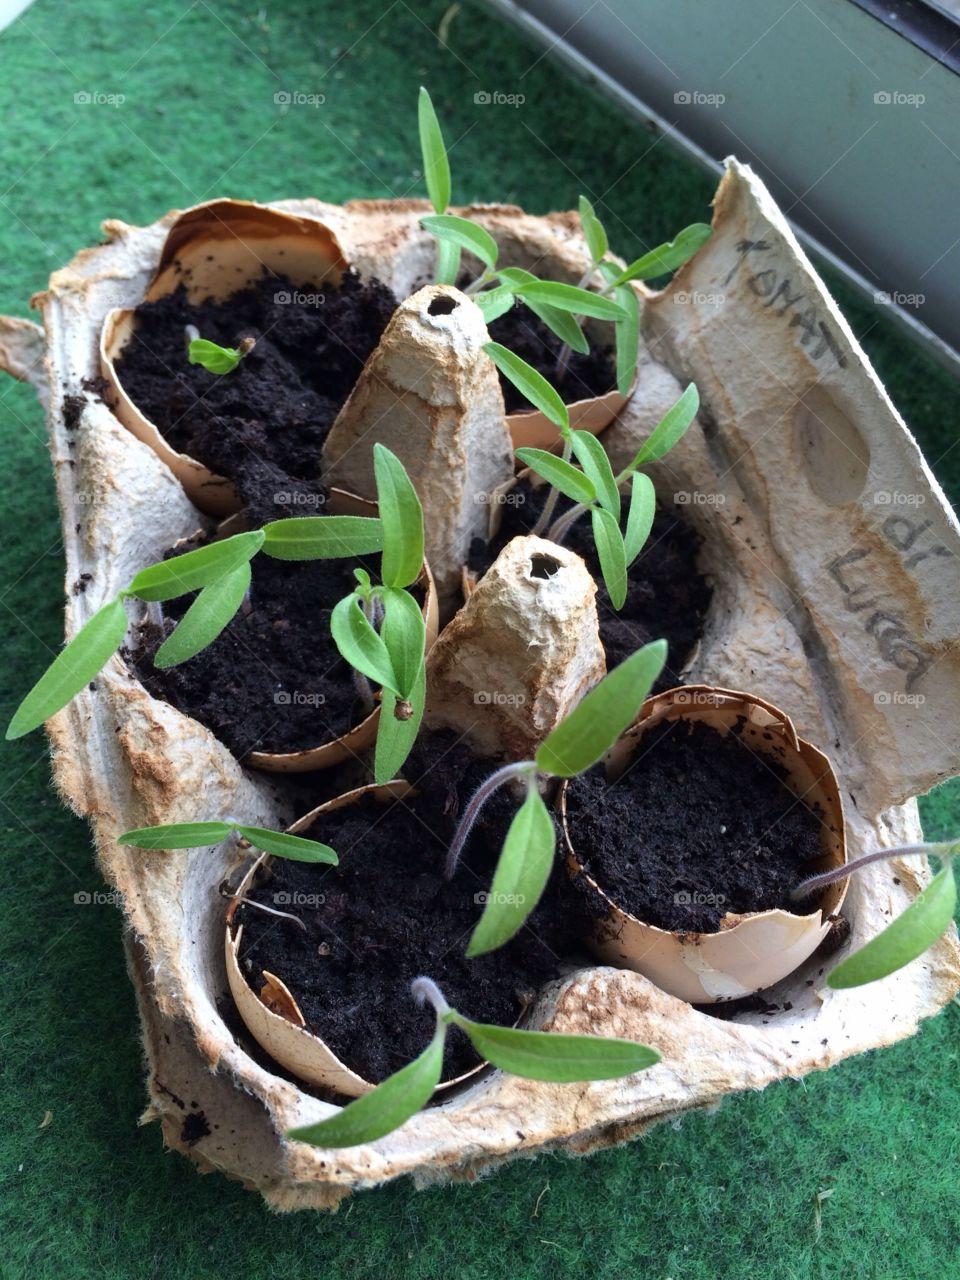 Planting in eggshell. Planting